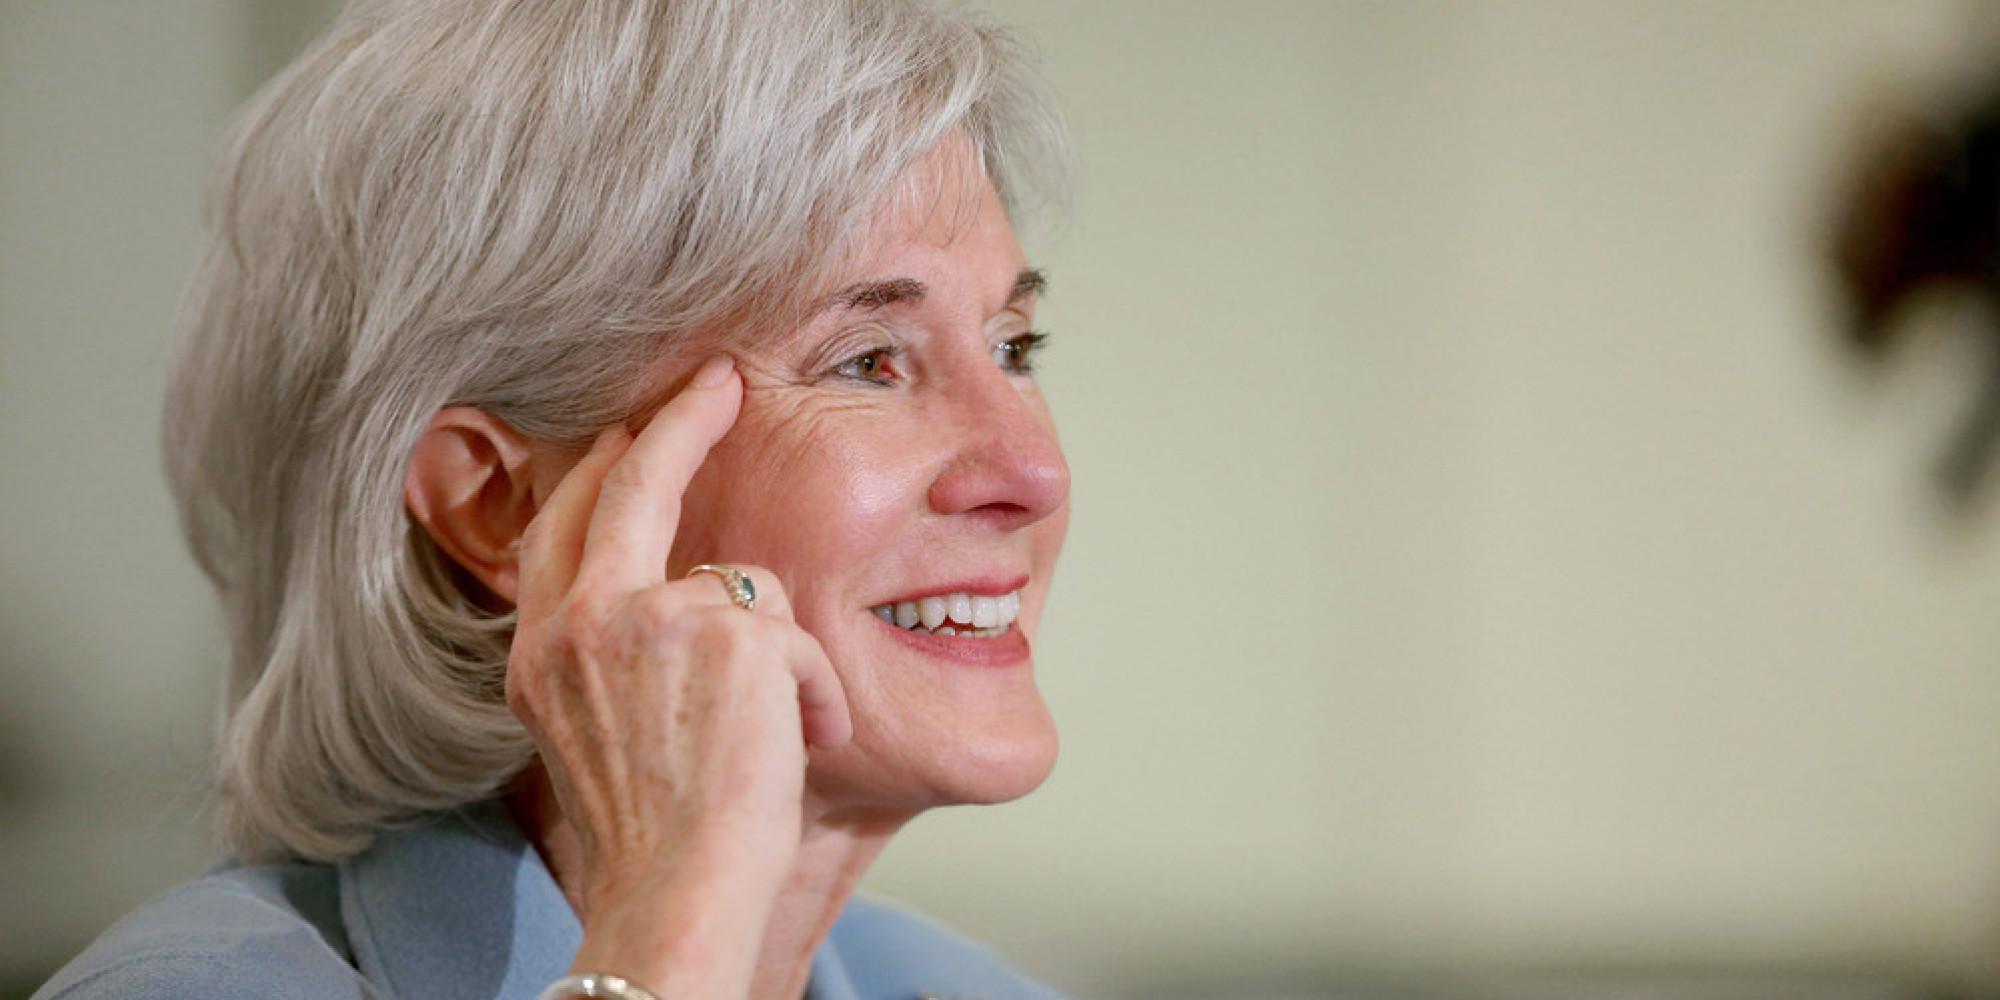 32 Million Underinsured in U.S., Report Finds